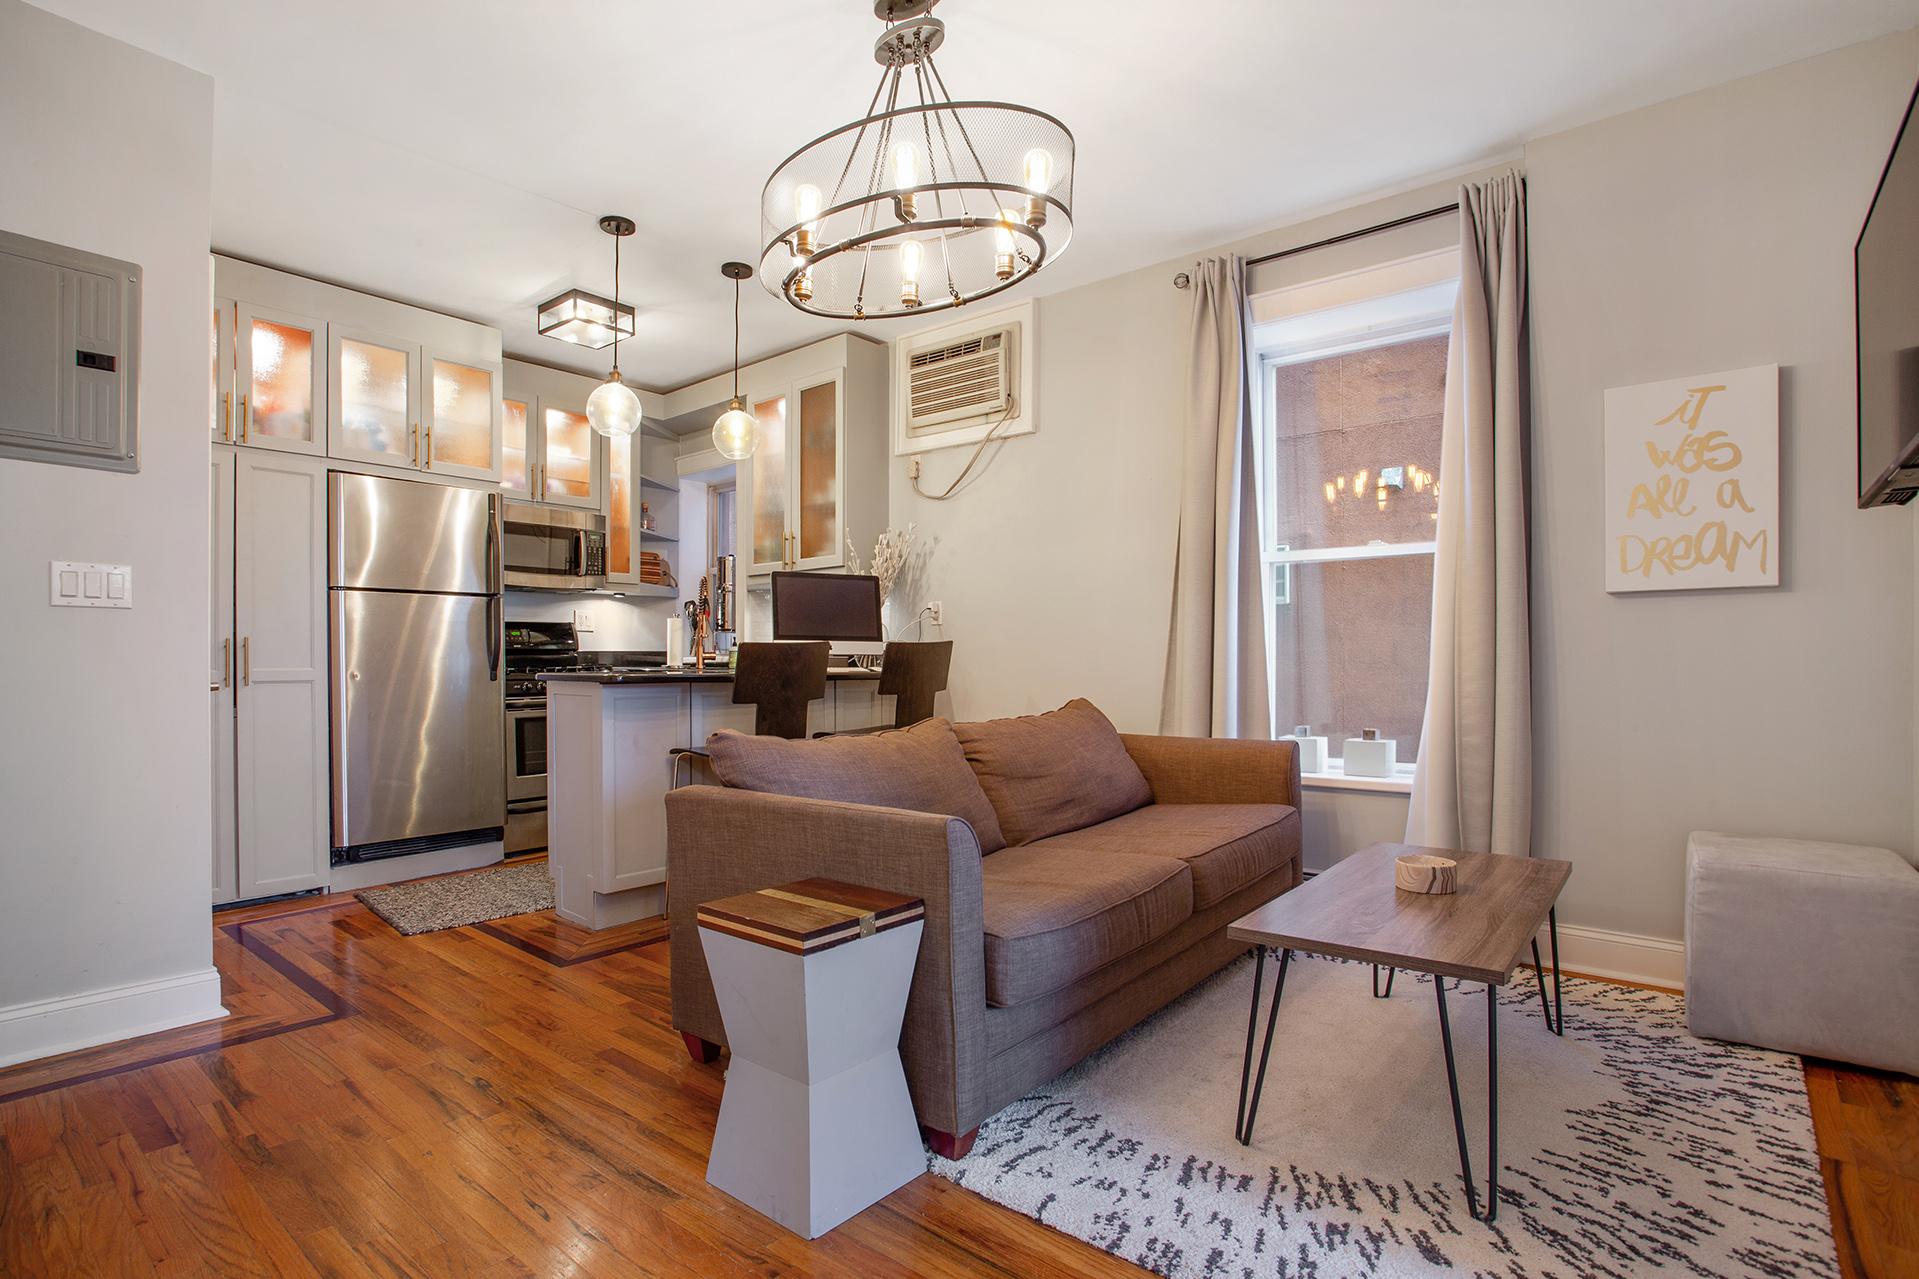 353 21st street, 2R - $530,000 - Greenwood Heights